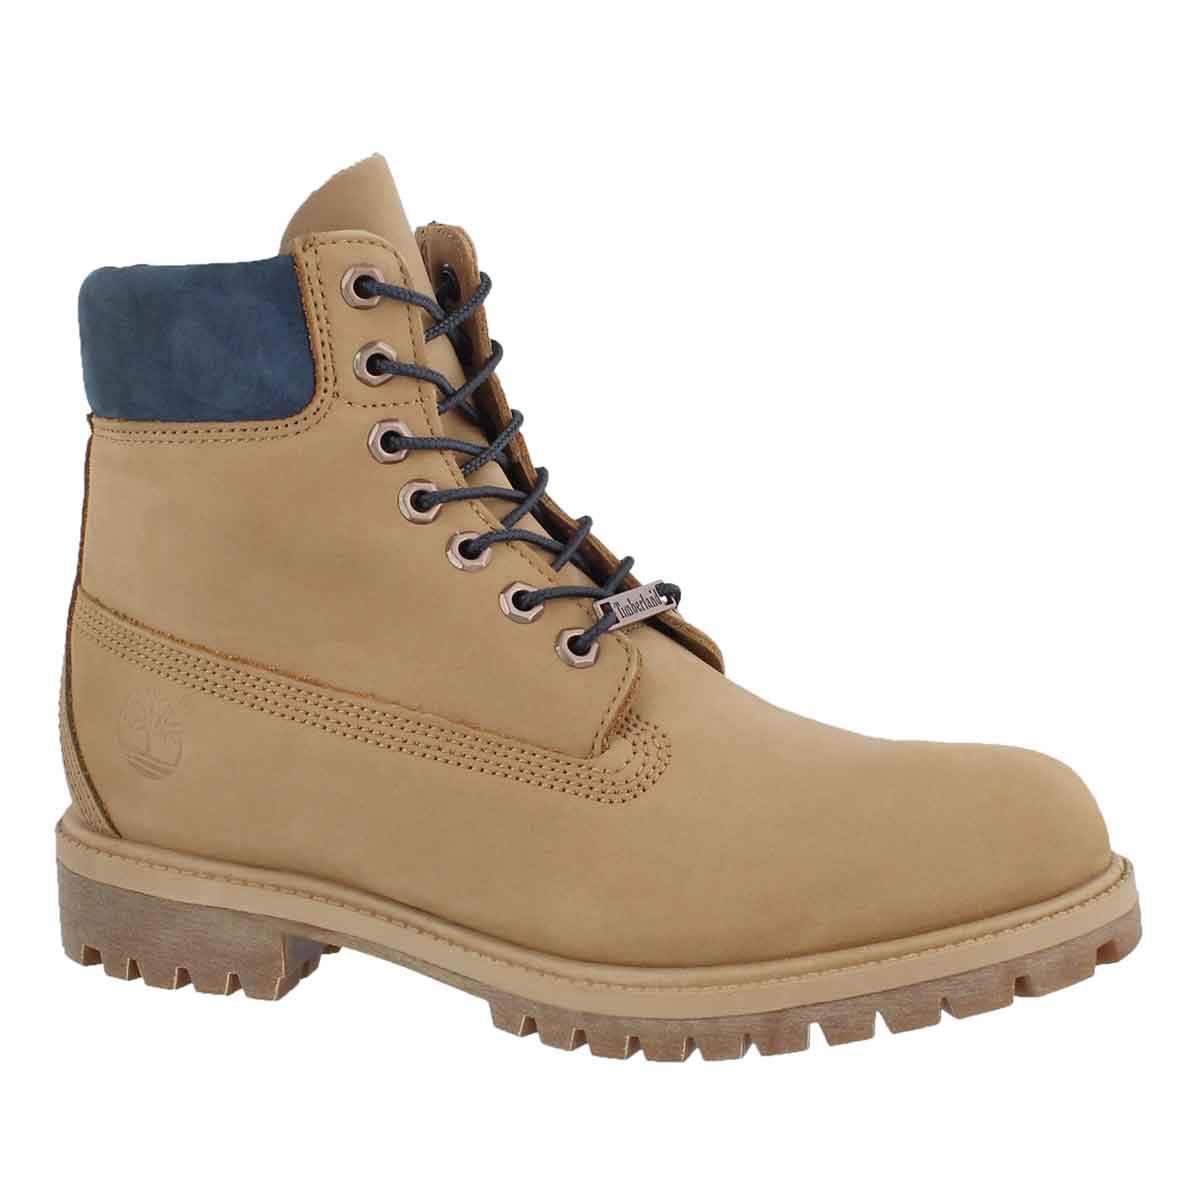 "Men's ICON 6"" PREMIUM light brown work boots"